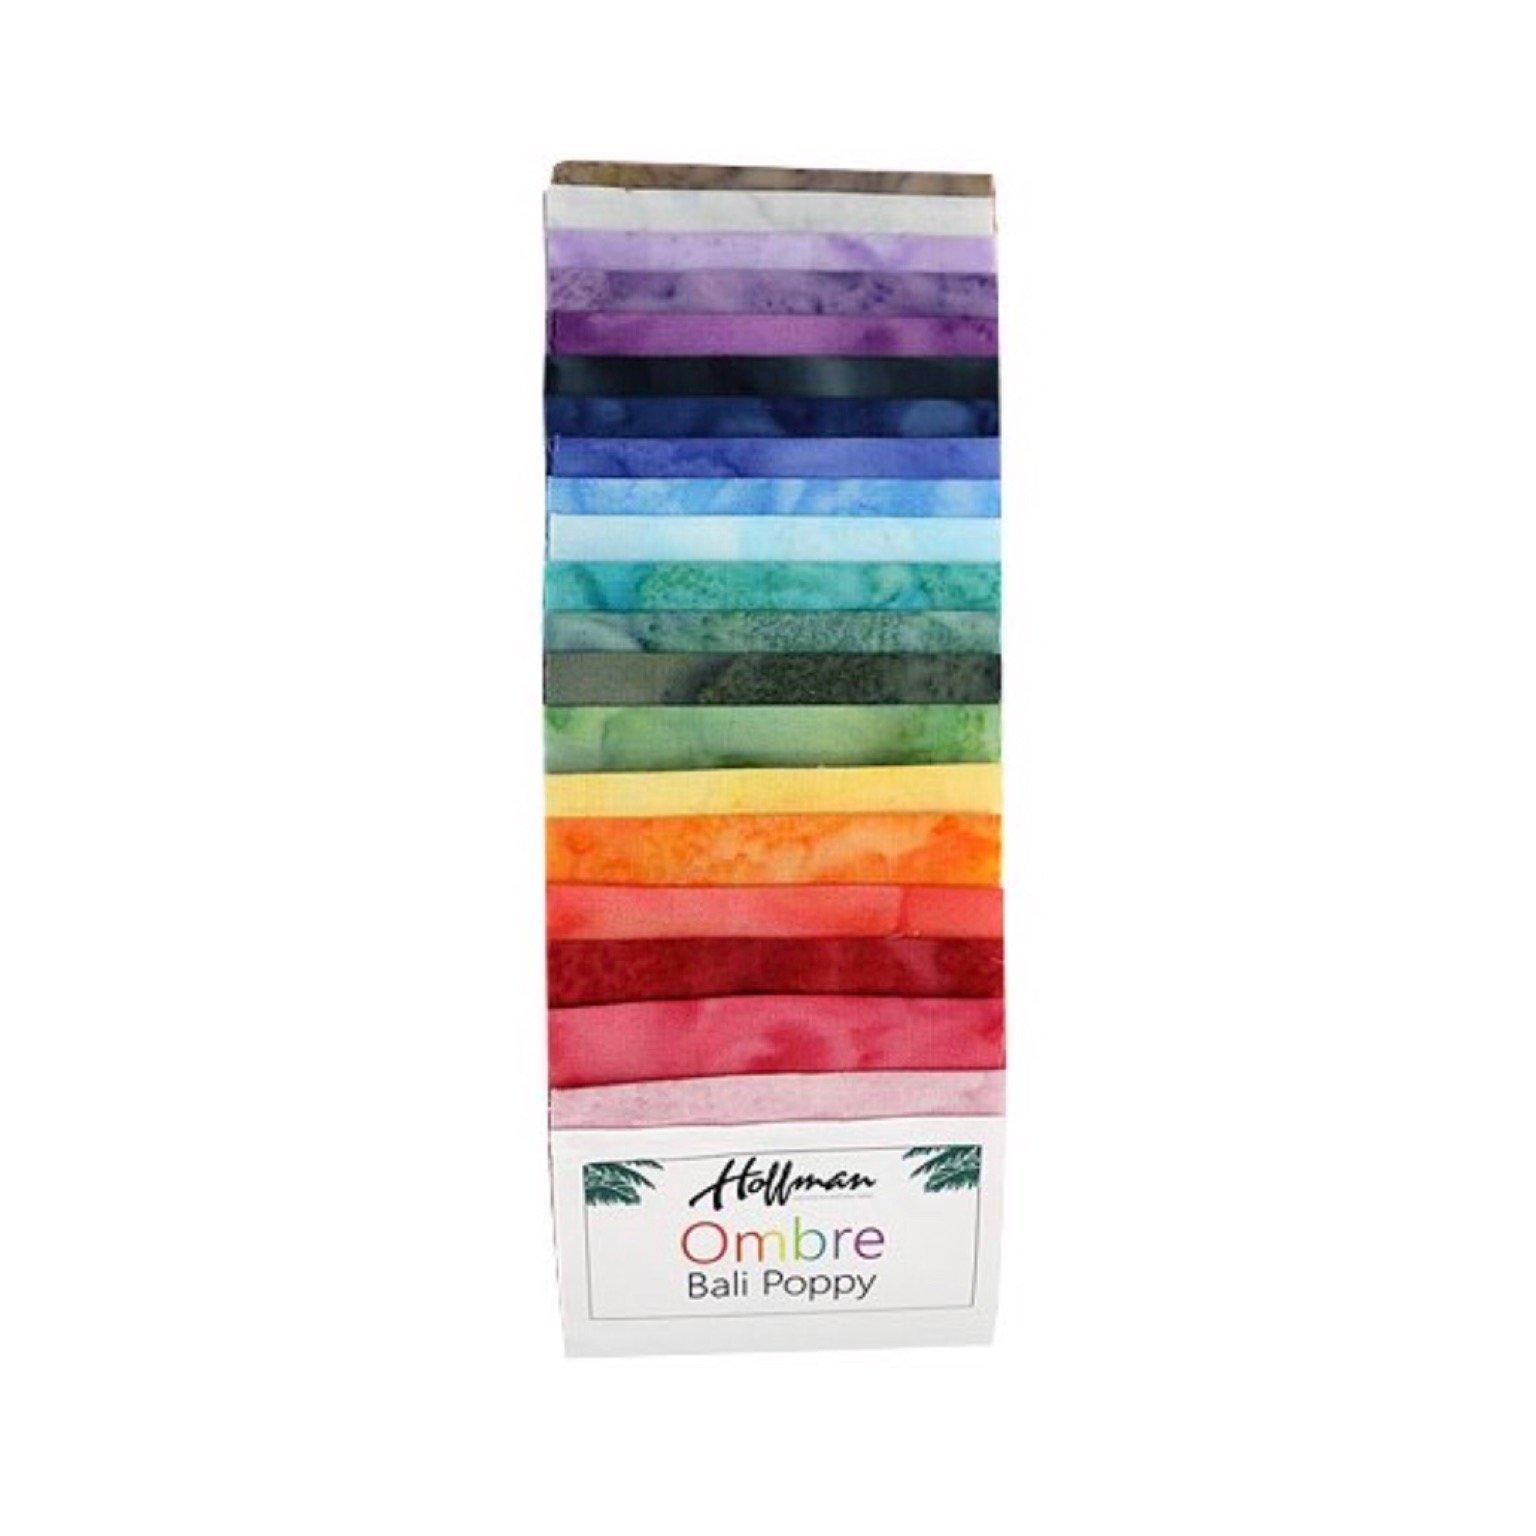 Trend-Tex Fabrics - Hoffman - Ombre Bali Poppy